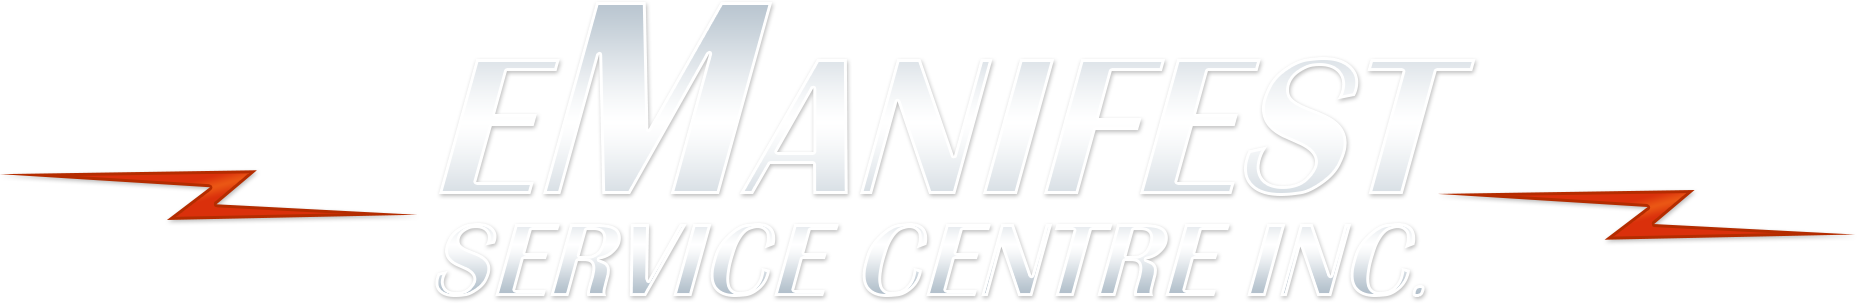 eManifest Service Centre Main Image